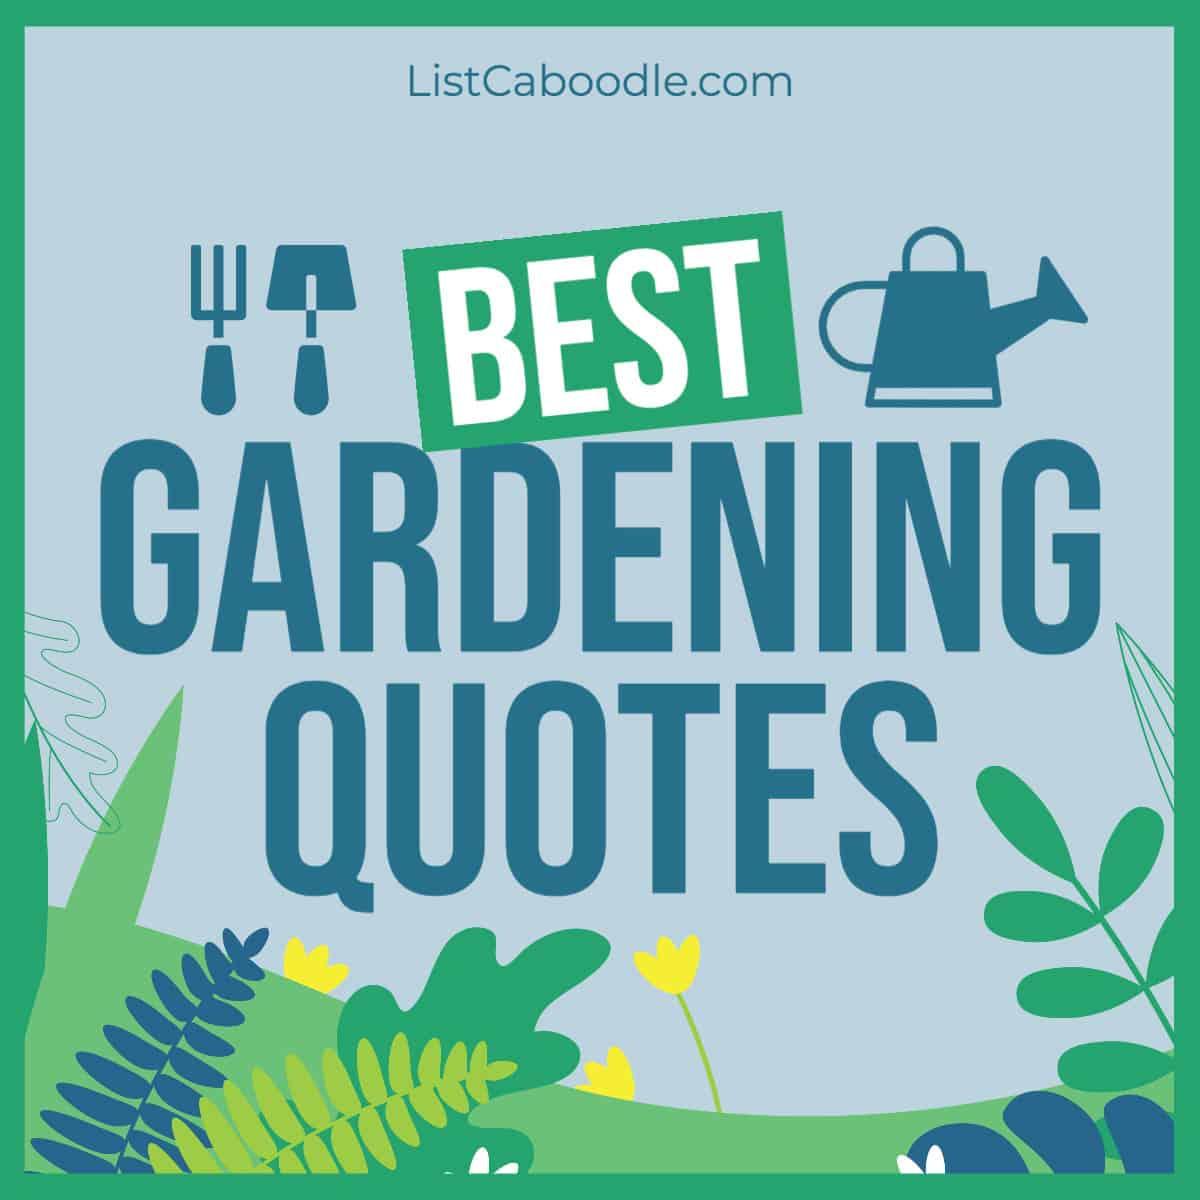 Best Gardening Quotes image